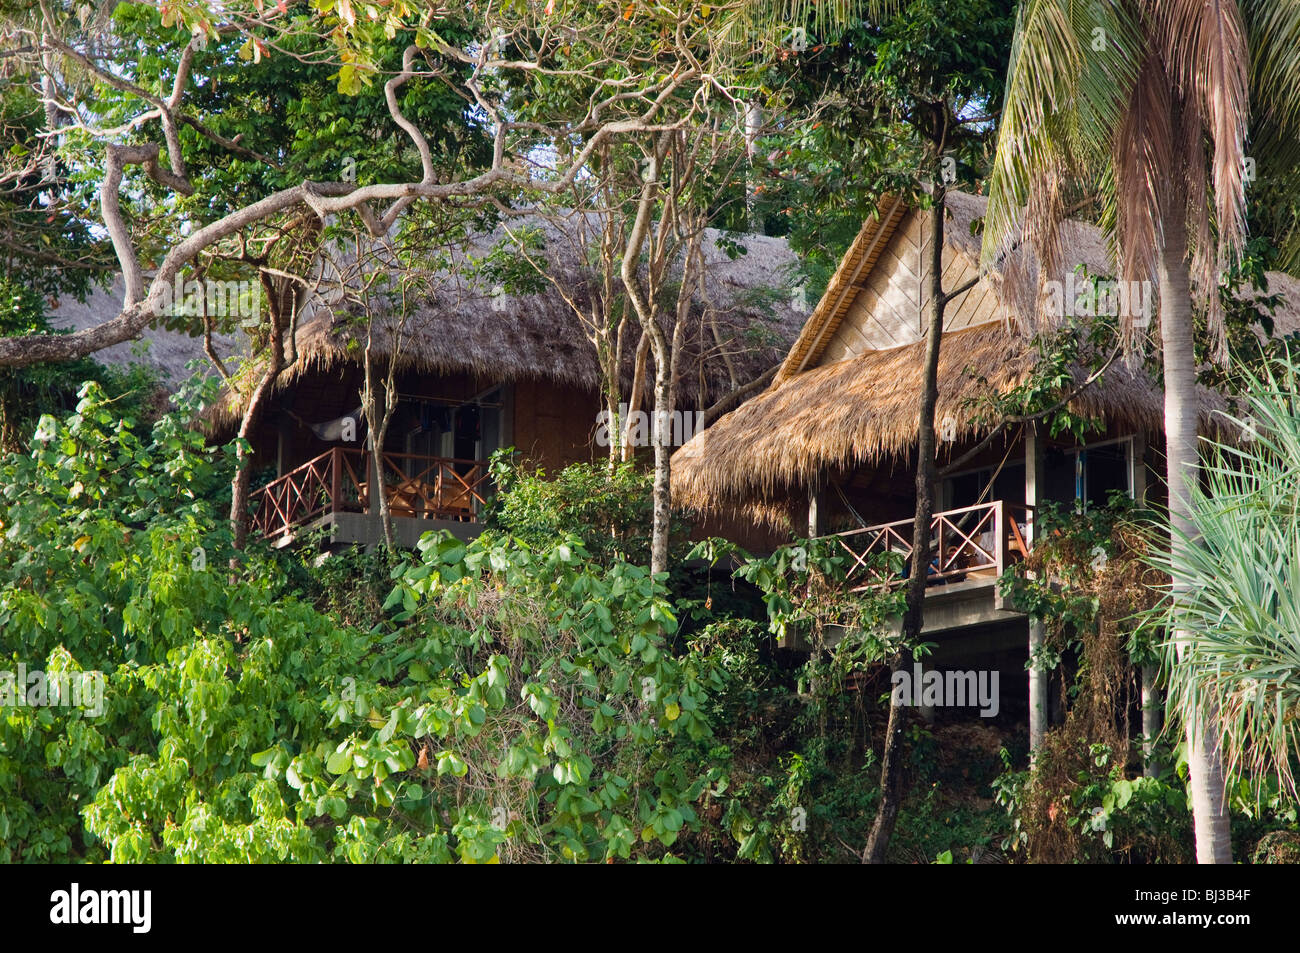 Exceptional Koh Lanta Beach Bungalows Part - 11: Bamboo Bungalows Of The Narima Resort, Klong Nin Beach, Ko Lanta Or Koh  Lanta Island, Krabi, Thailand, Asia